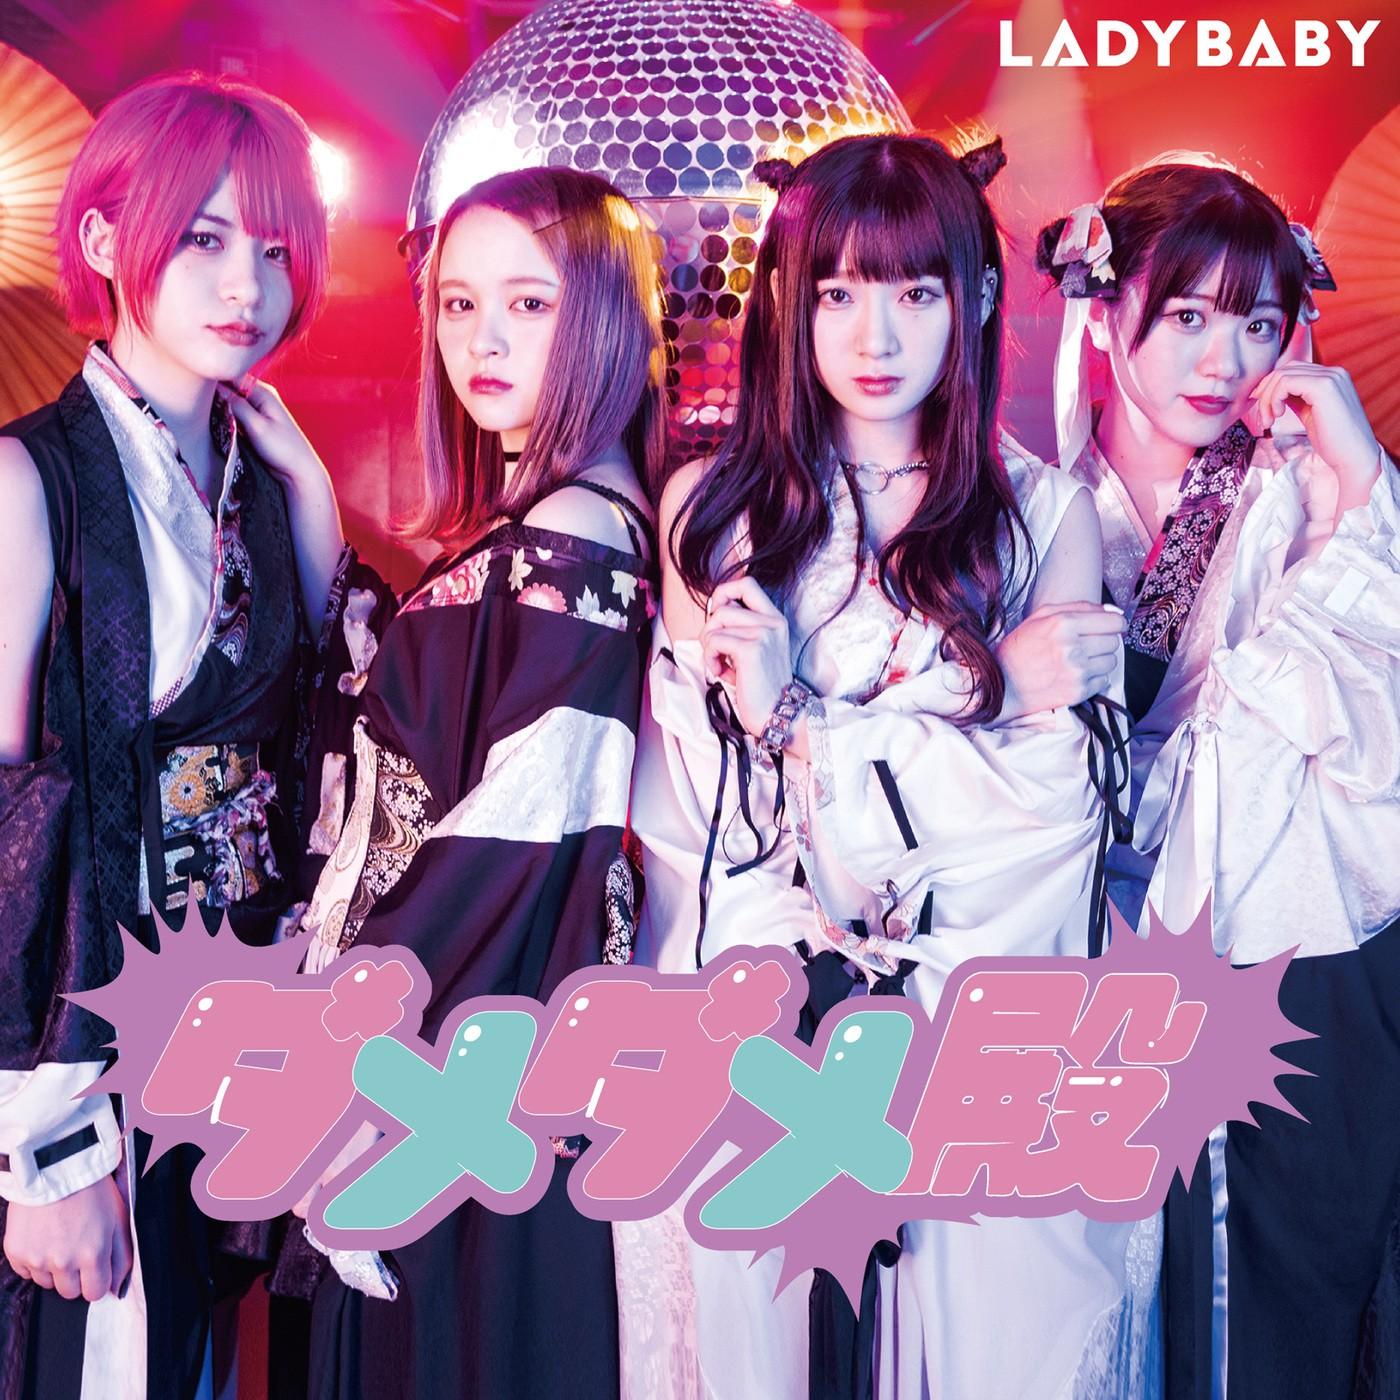 LADYBABY – ダメダメ殿 [FLAC + MP3 320 / WEB] [2018 10 10] – J-pop